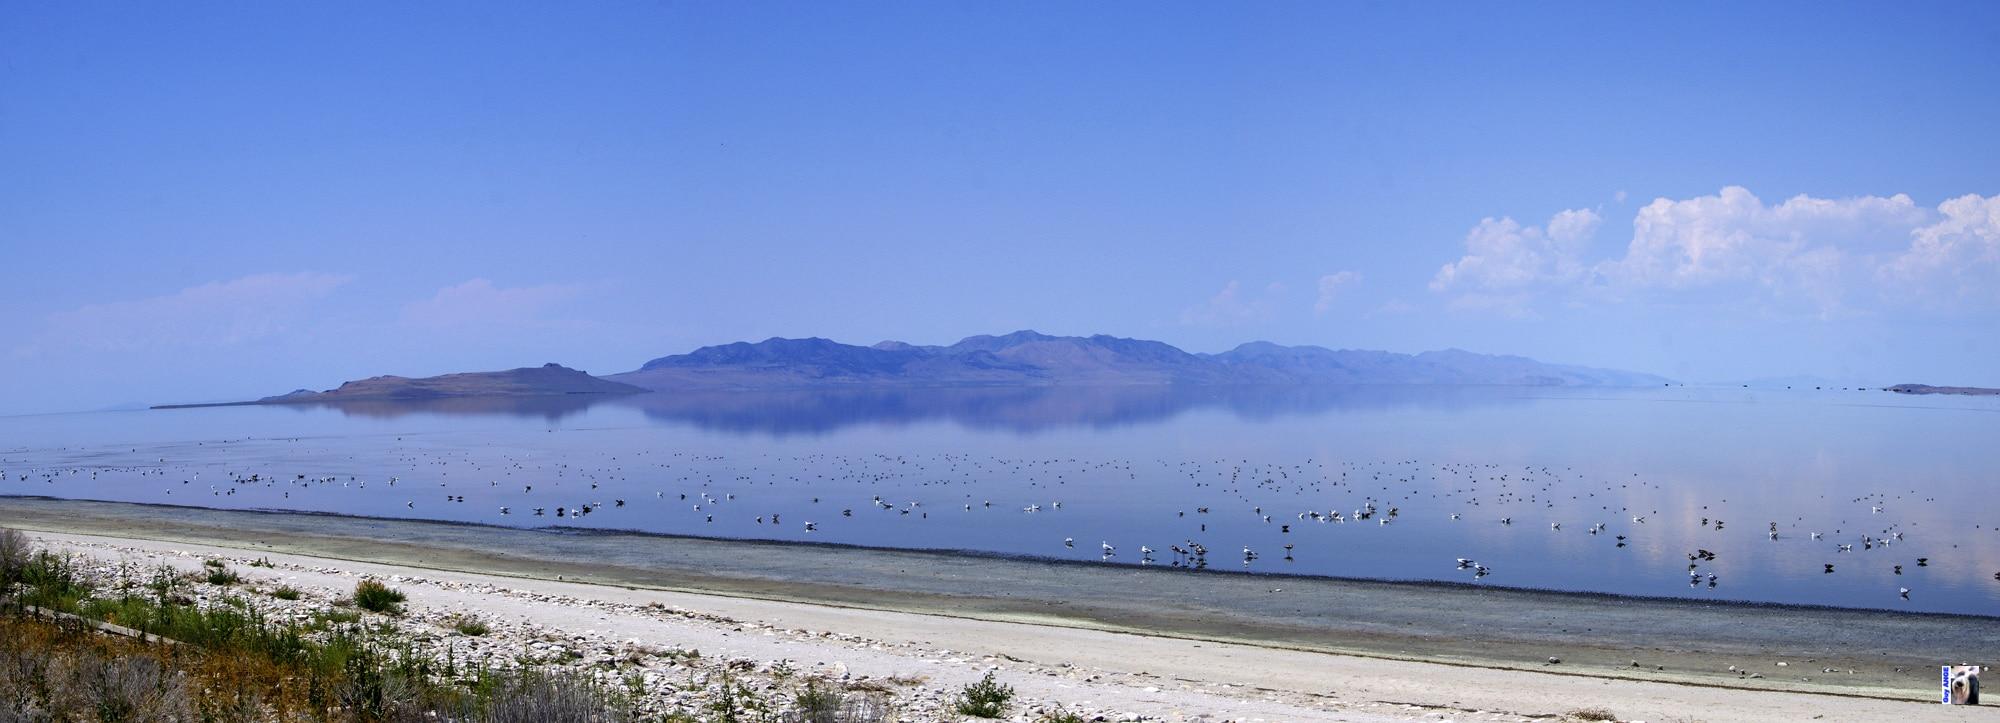 Antelop Island. Great Salt Lake State Park